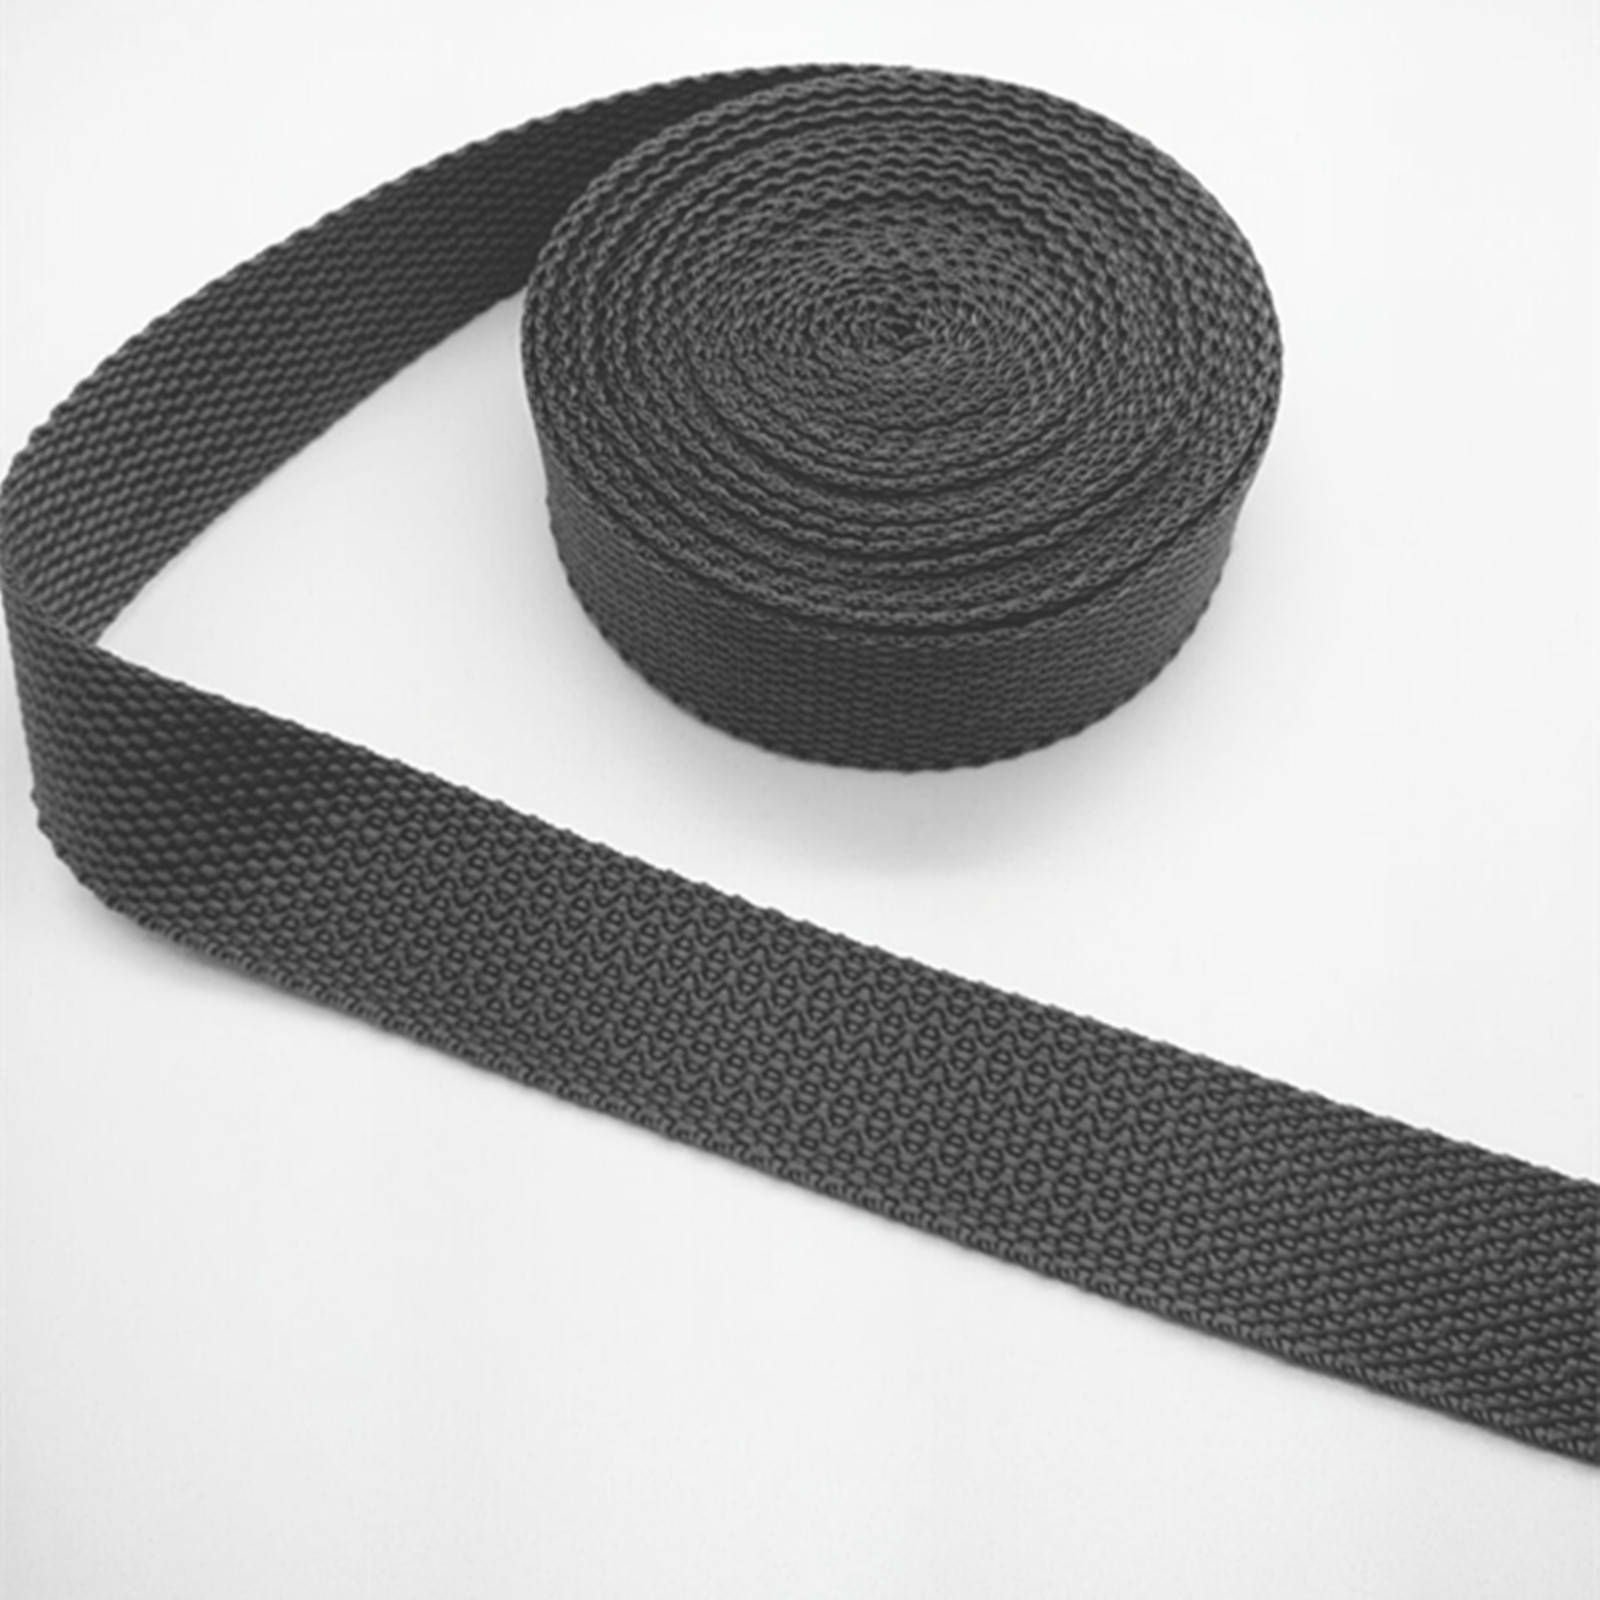 New Hot 5Yards 1Inch 25mm Width Length Strap Nylon Webbing Strapping  gray